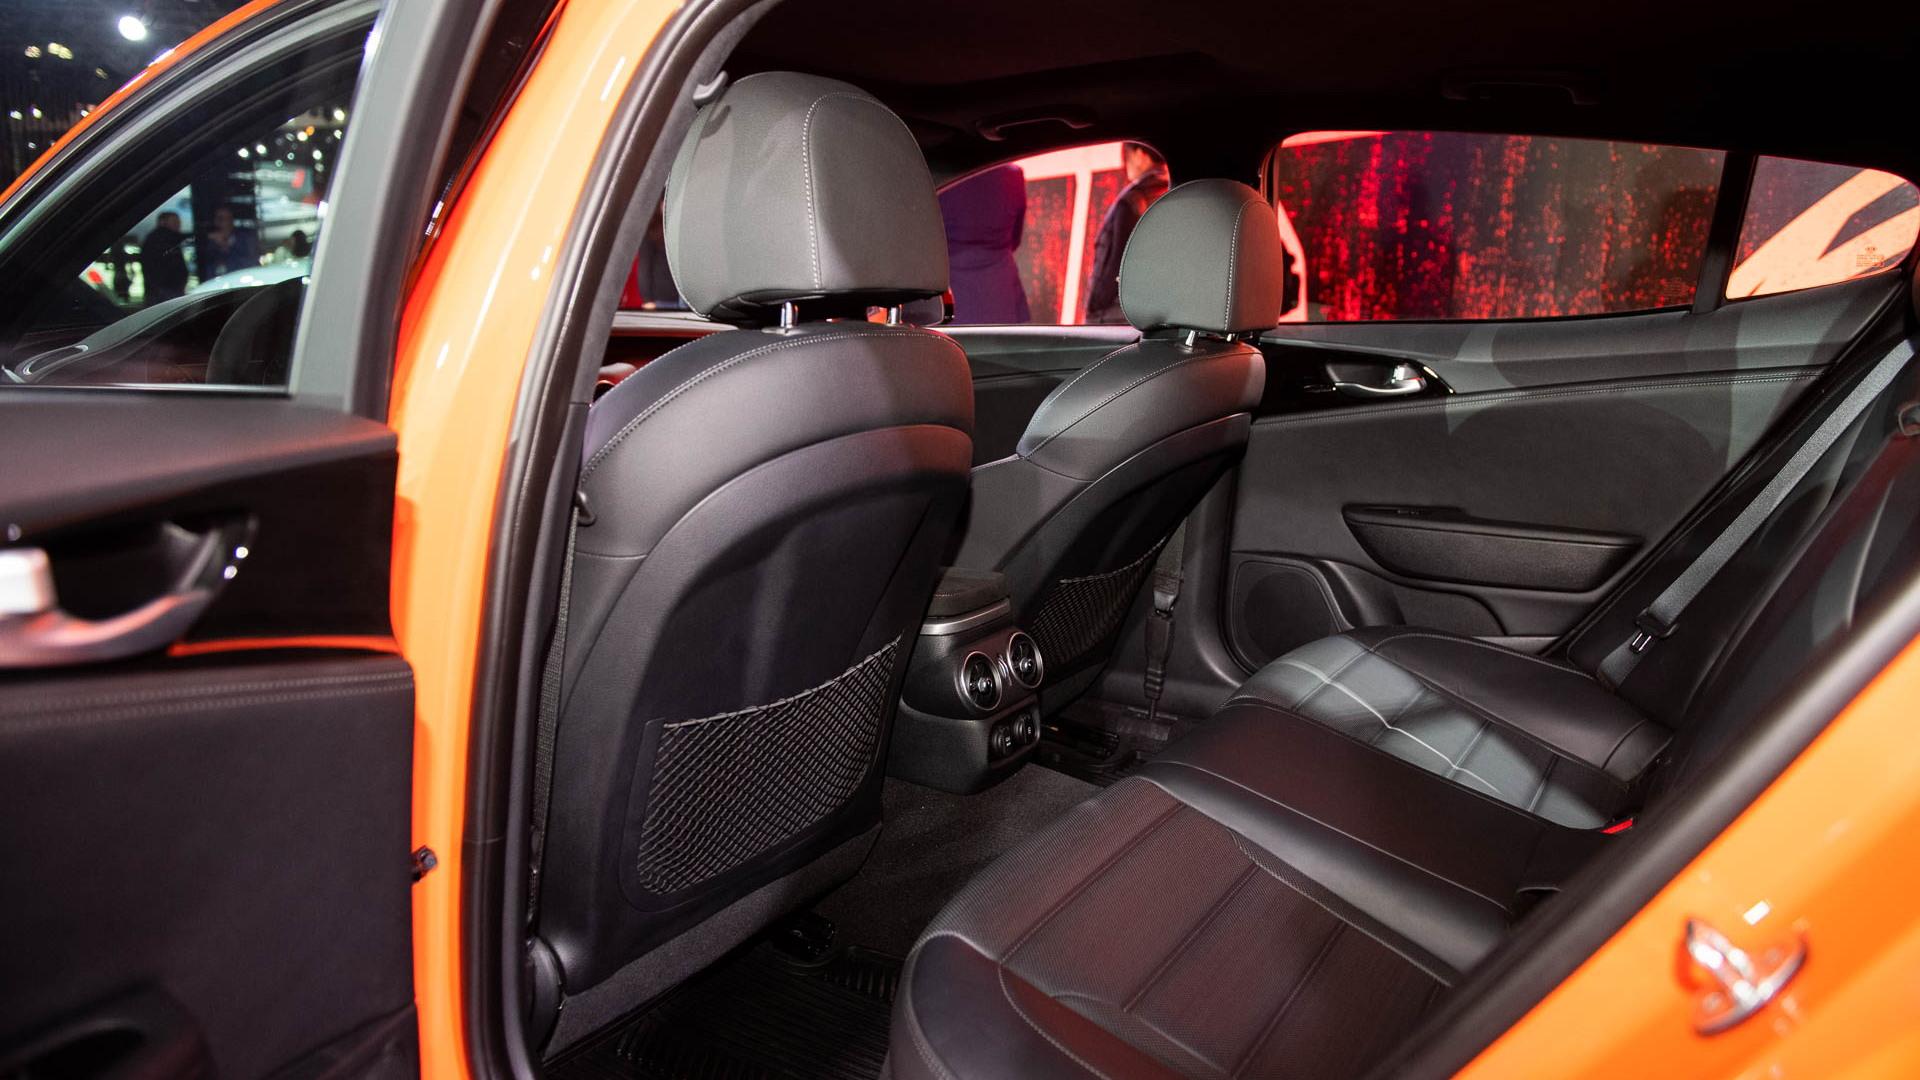 2019 Kia Stinger GTS, 2019 New York International Auto Show